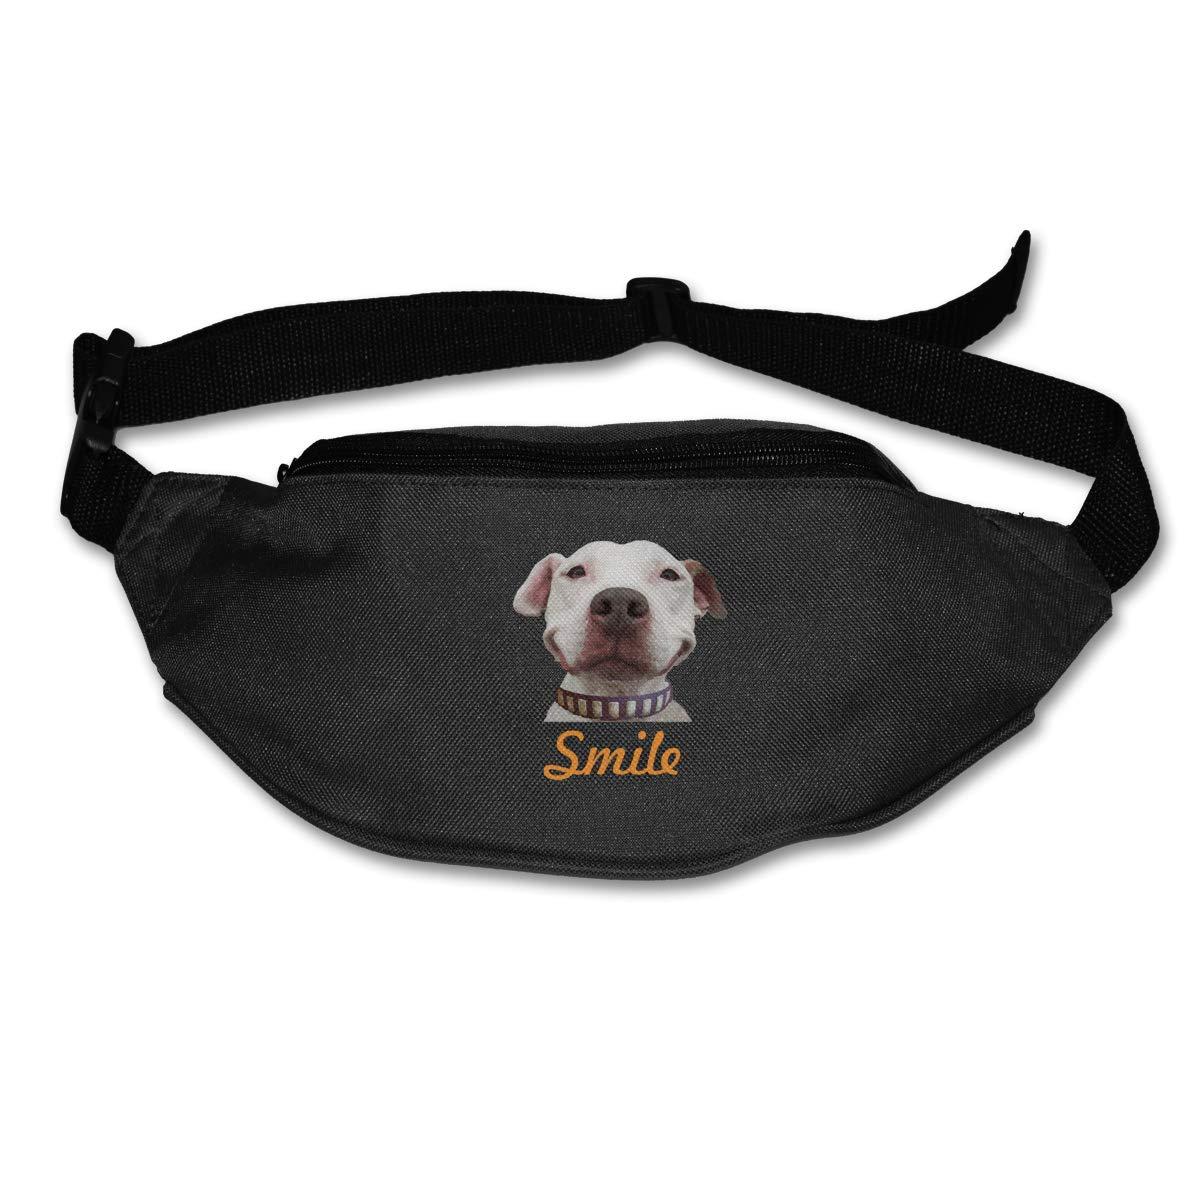 Smile Pit Bull Sport Waist Packs Fanny Pack Adjustable For Hike